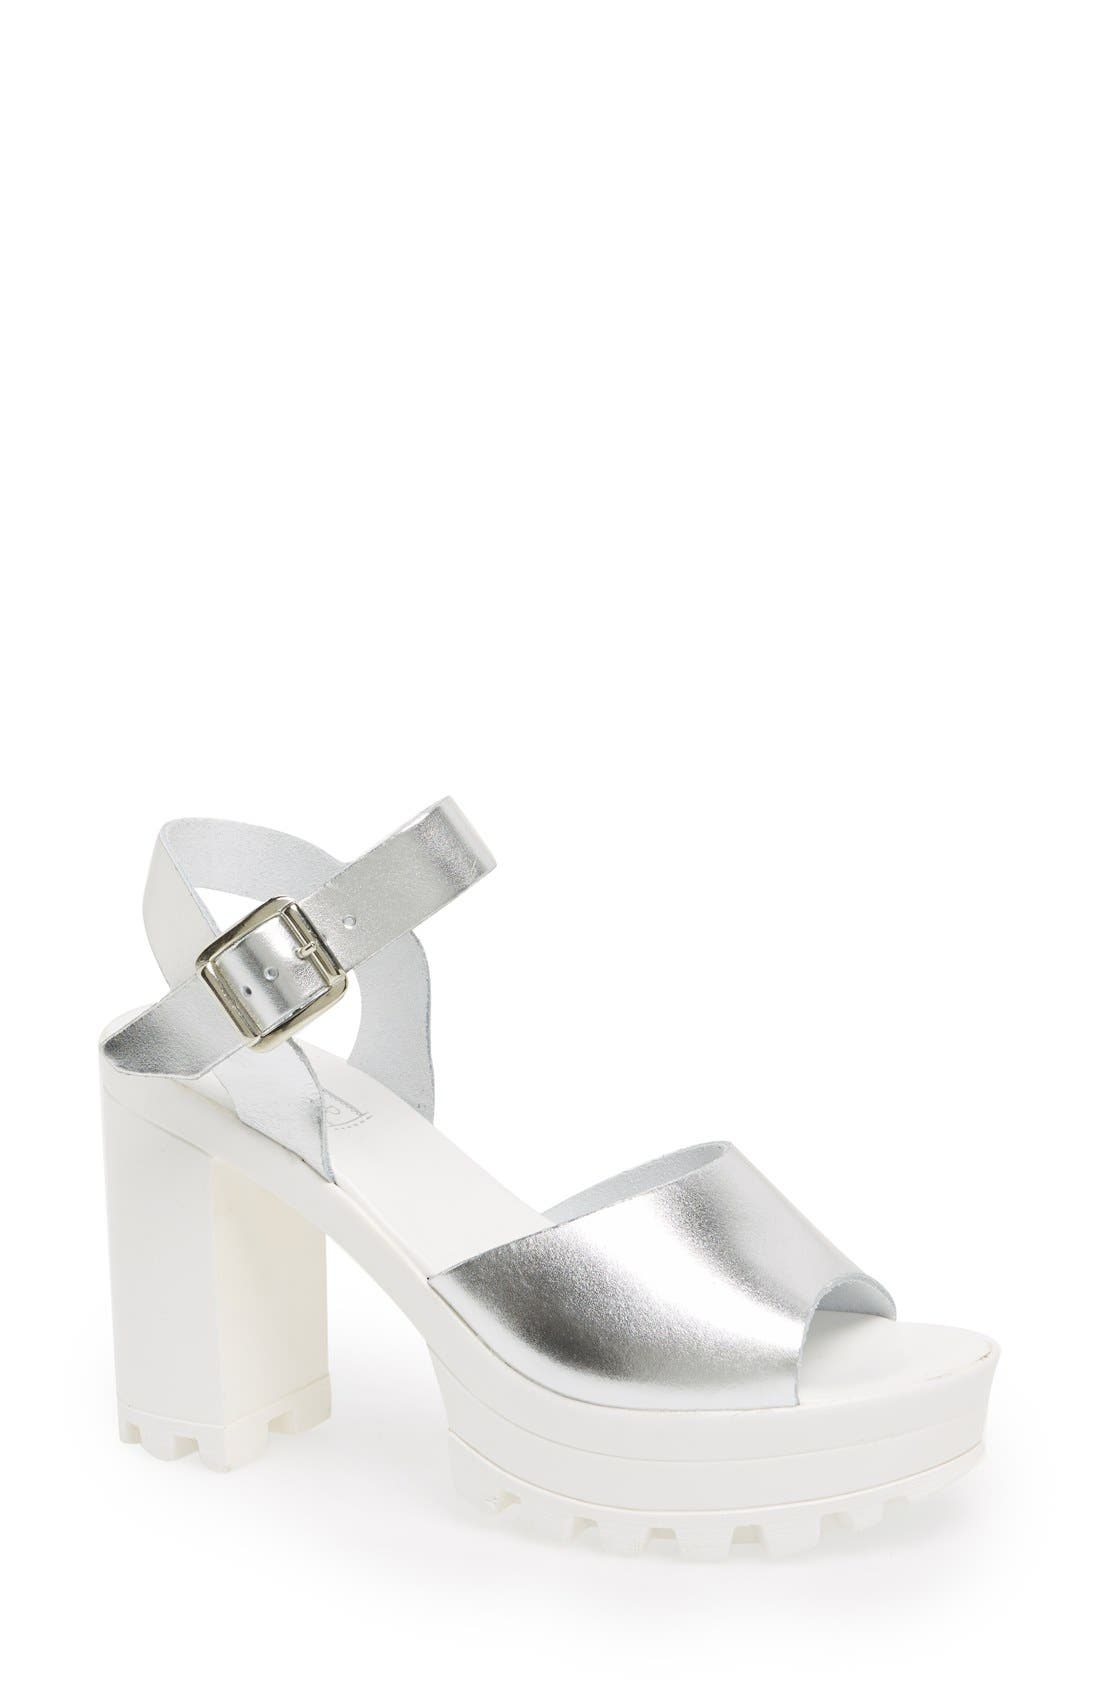 Alternate Image 1 Selected - Topshop 'Lena' Chunky Sole Platform Sandal (Women)